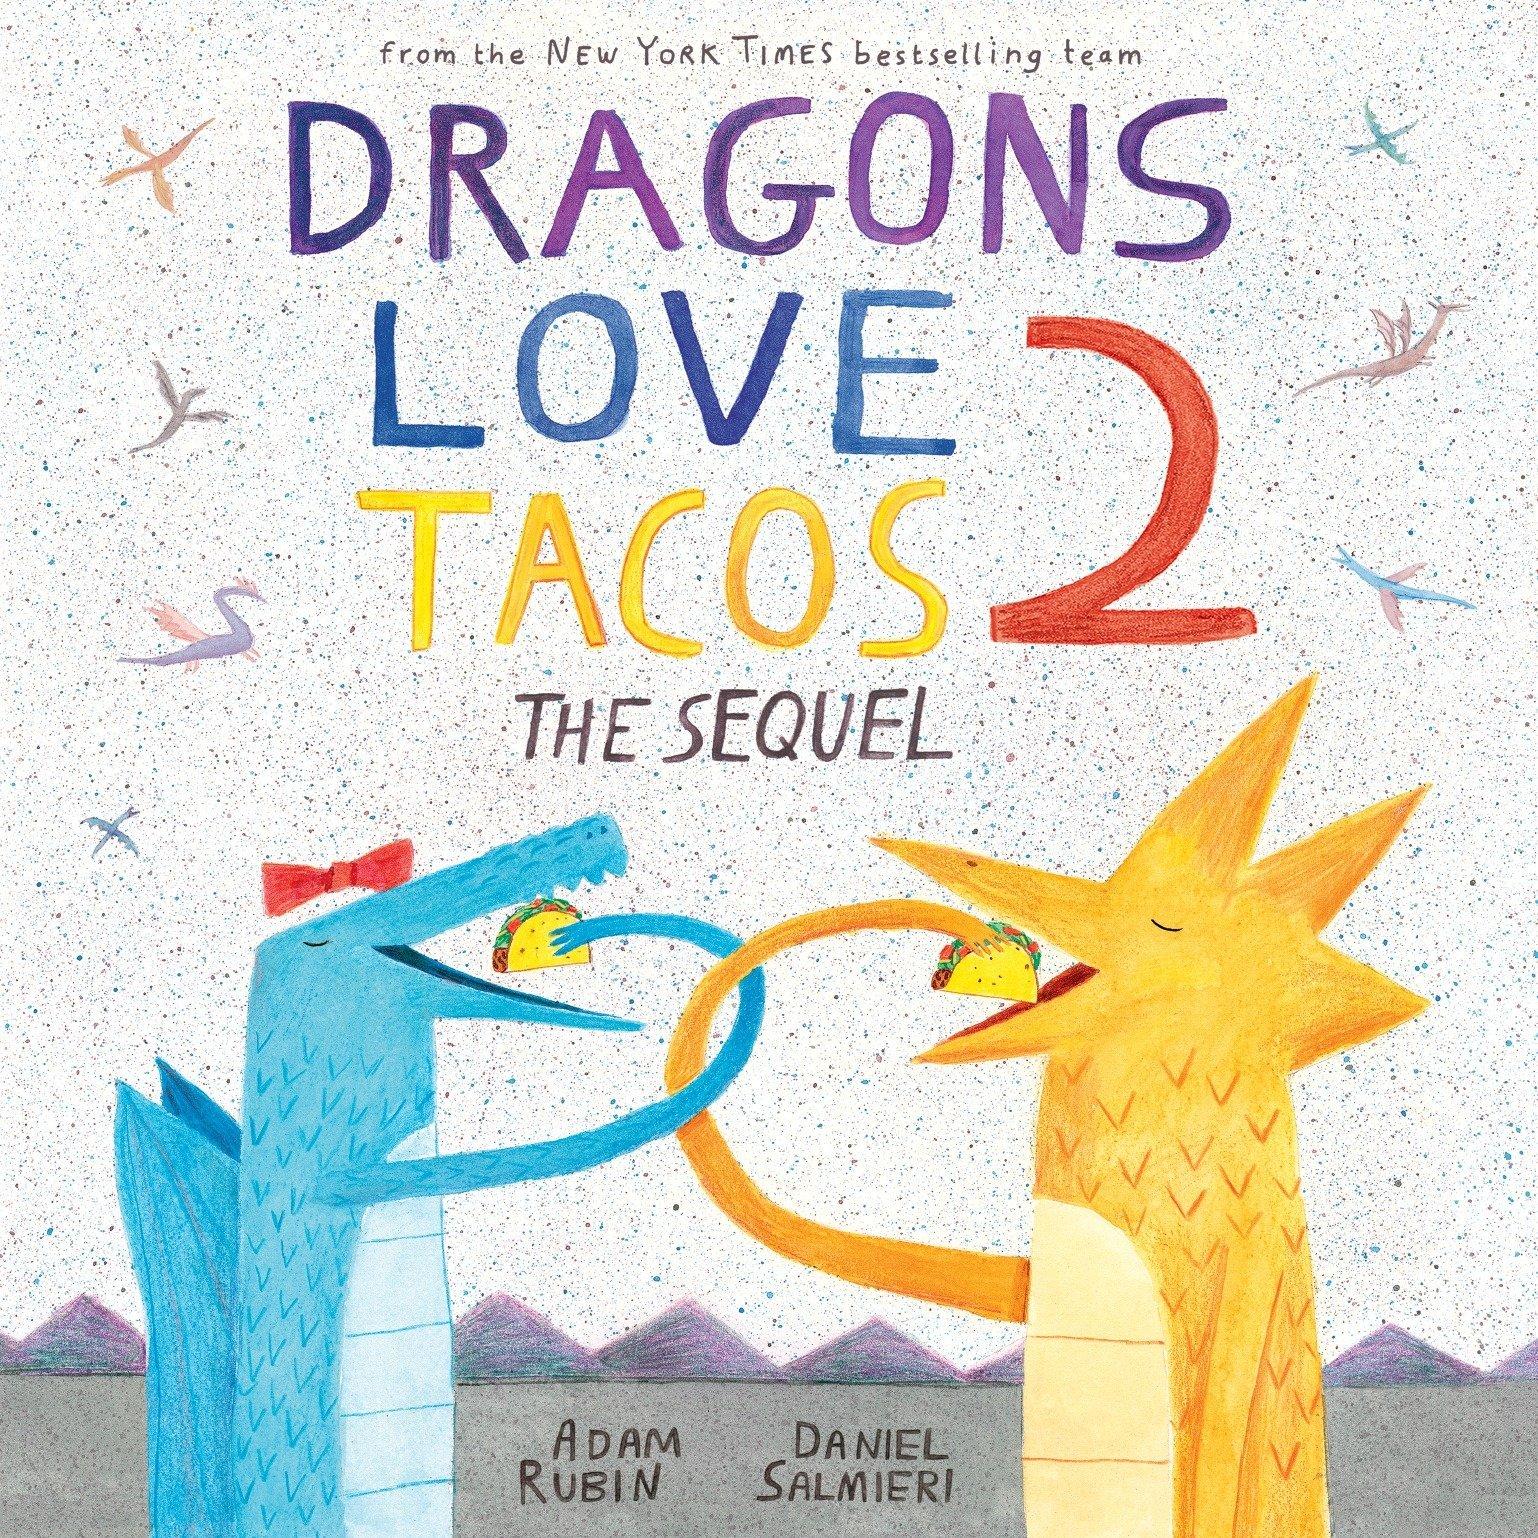 Dragons Love Tacos 2 The Sequel by Adam Rubin.jpg